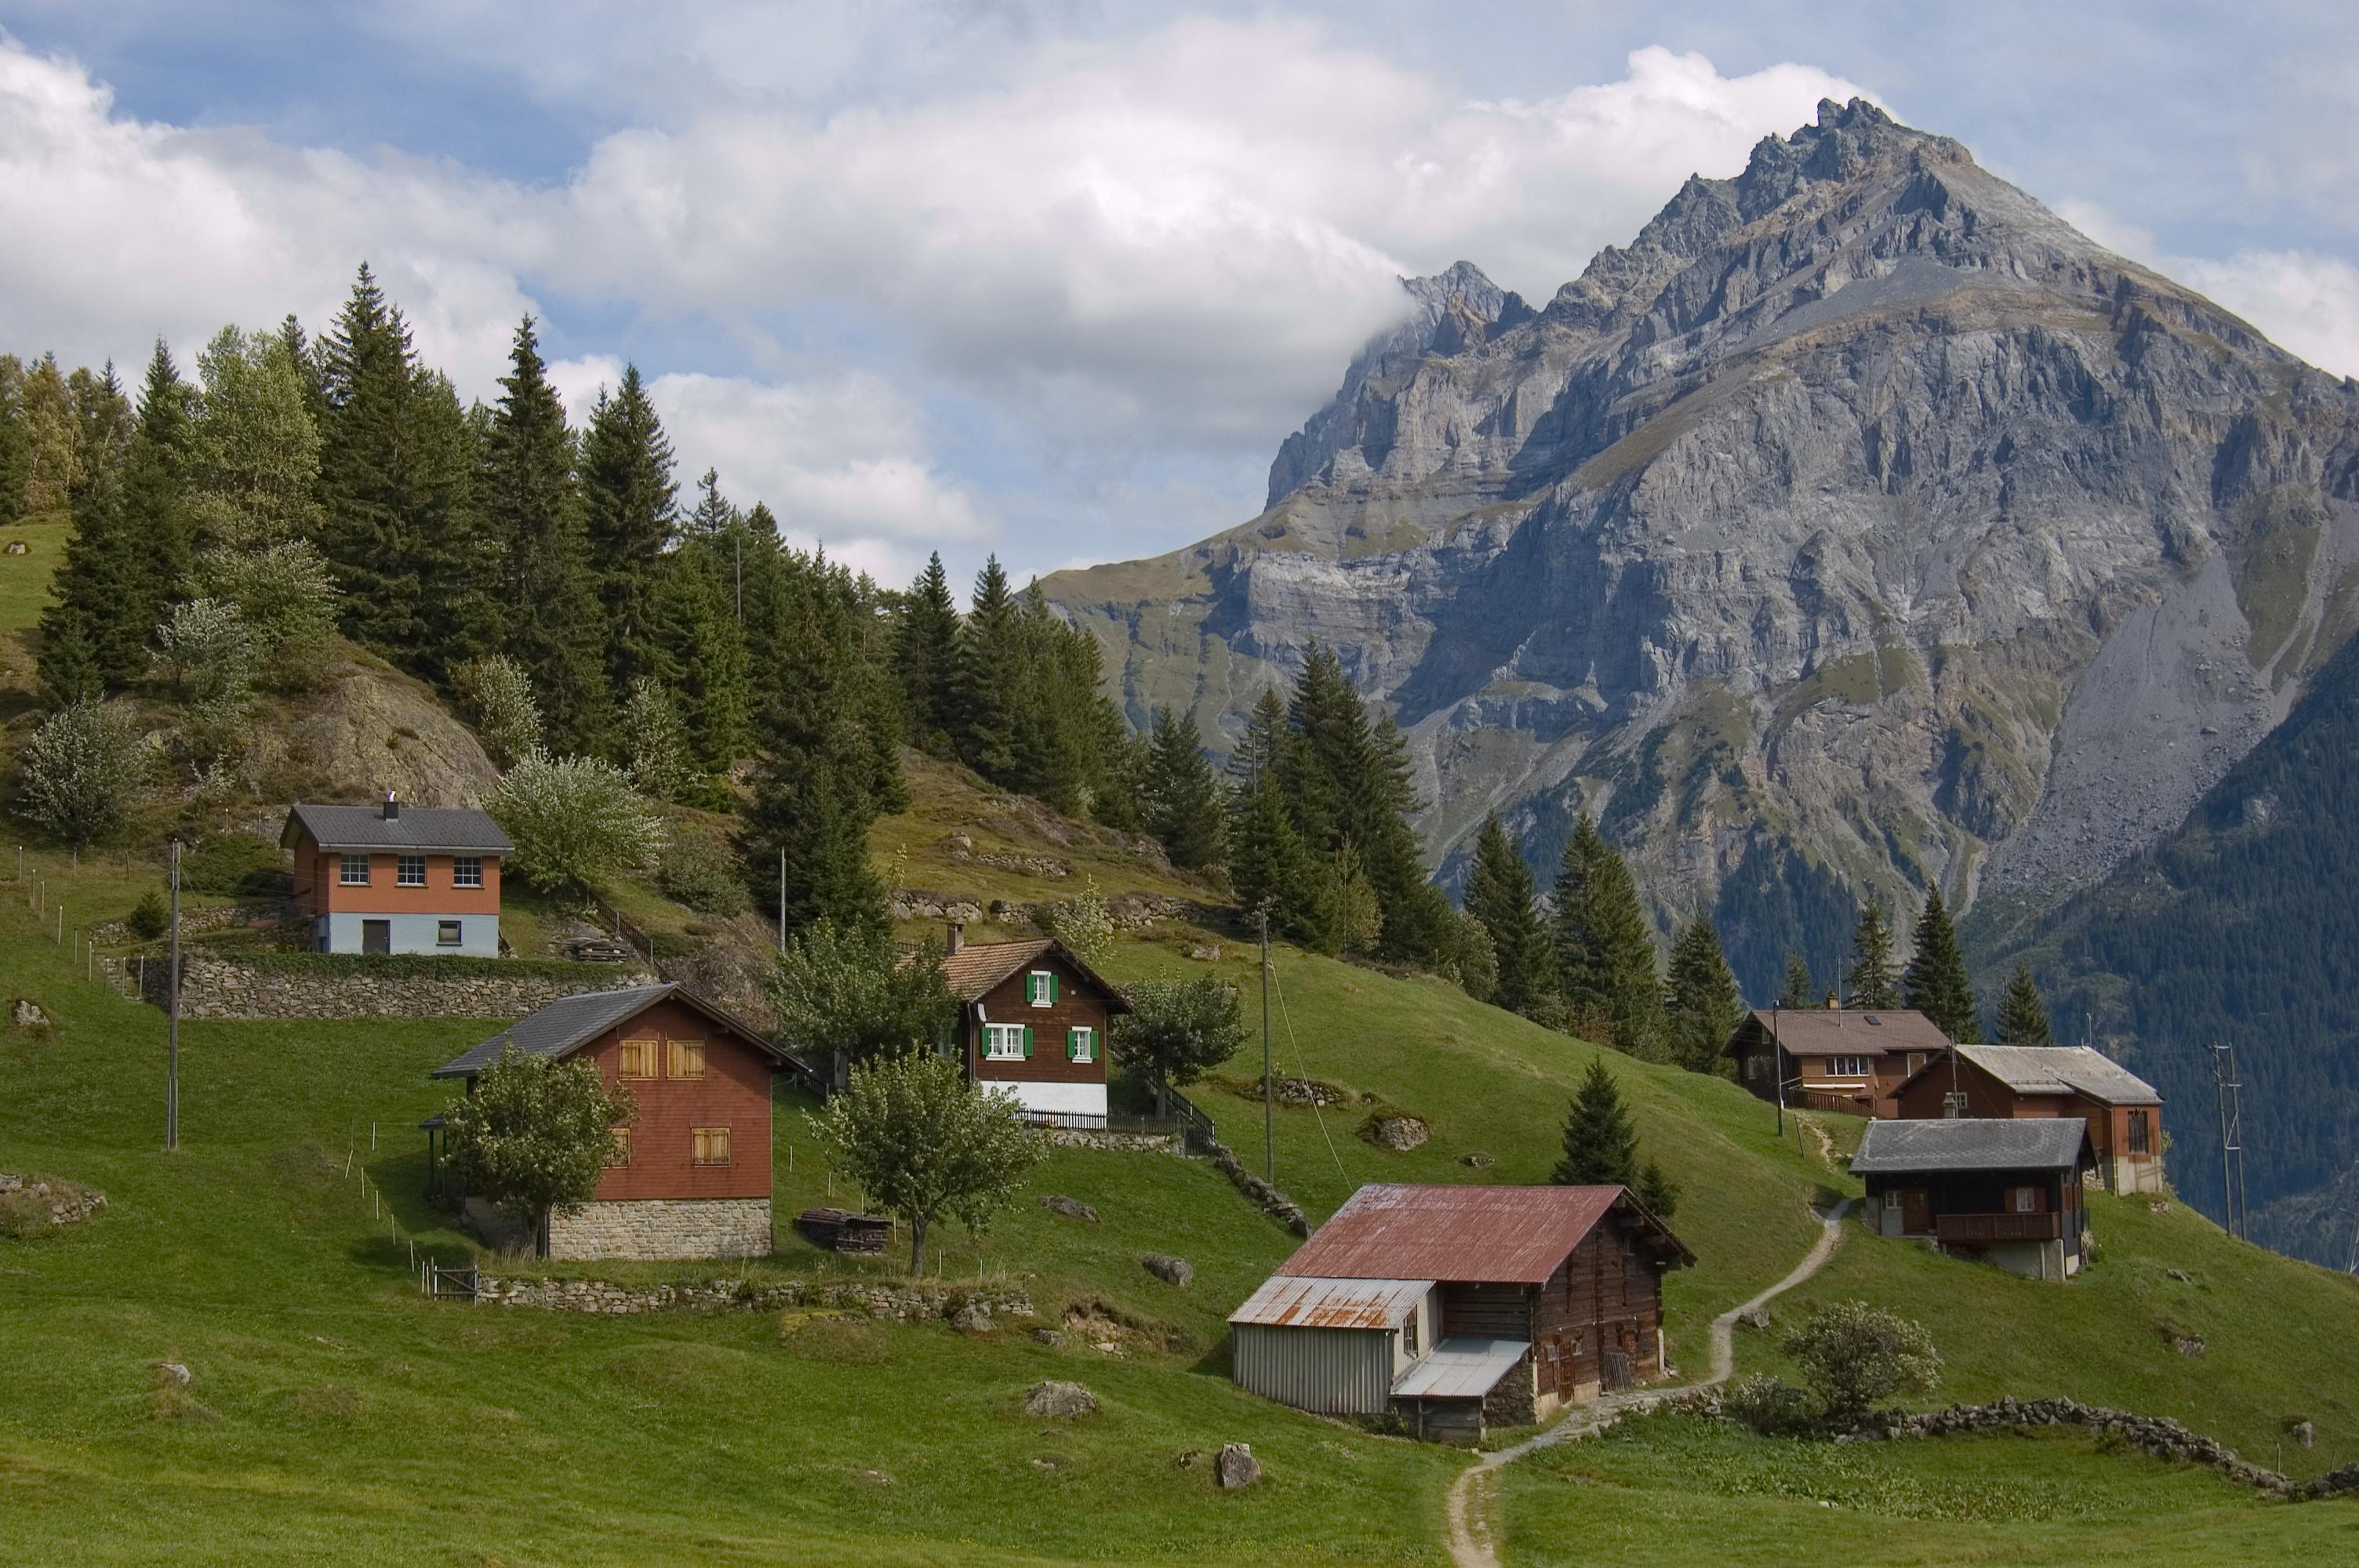 File landscape arnisee region jpg wikimedia commons - Landscaping fotos ...